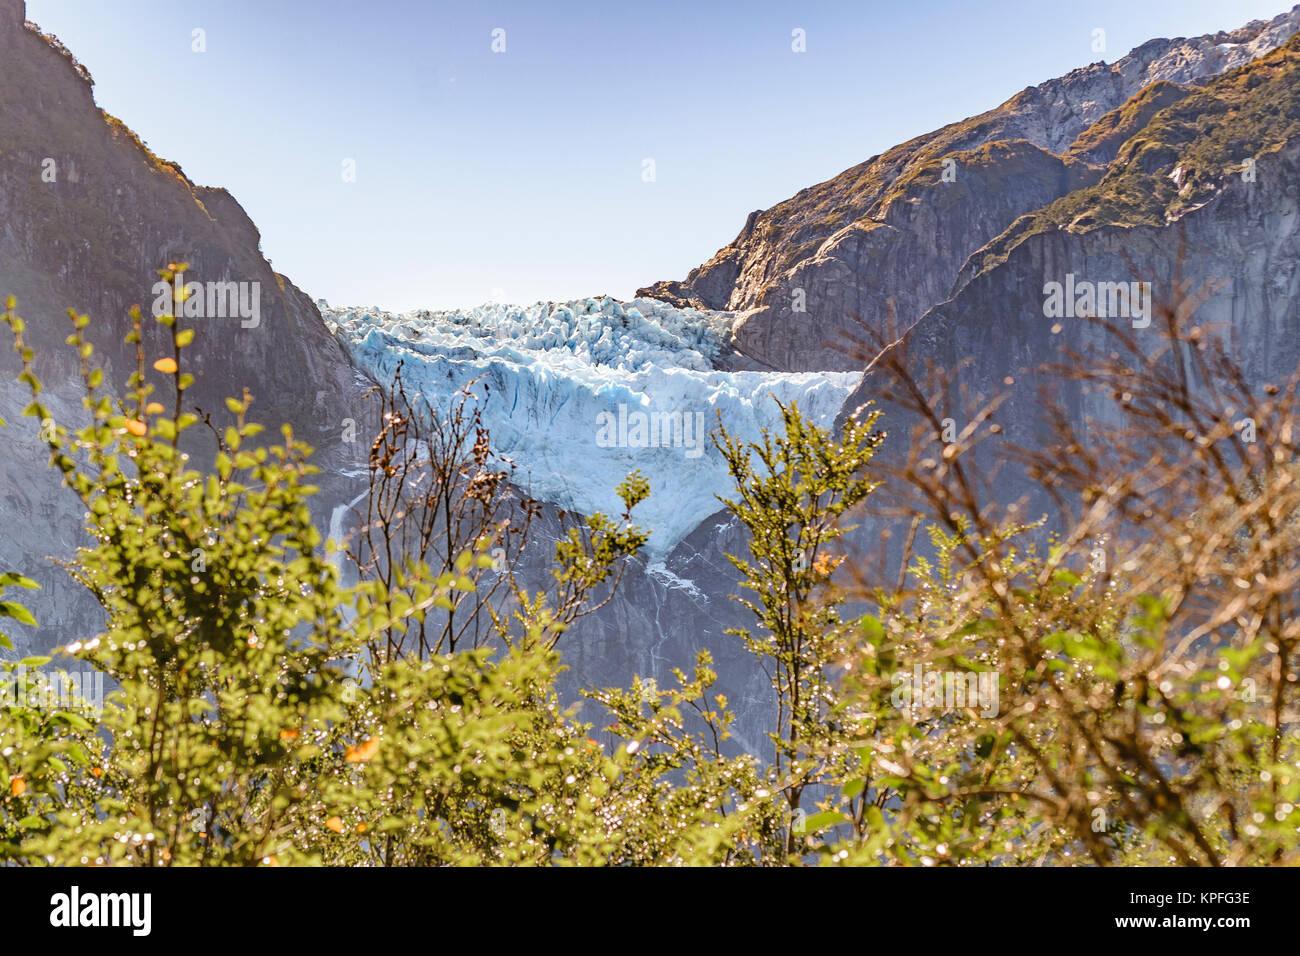 Queulat mountain with glacier at top at queulat national park, Aysen, Chile - Stock Image